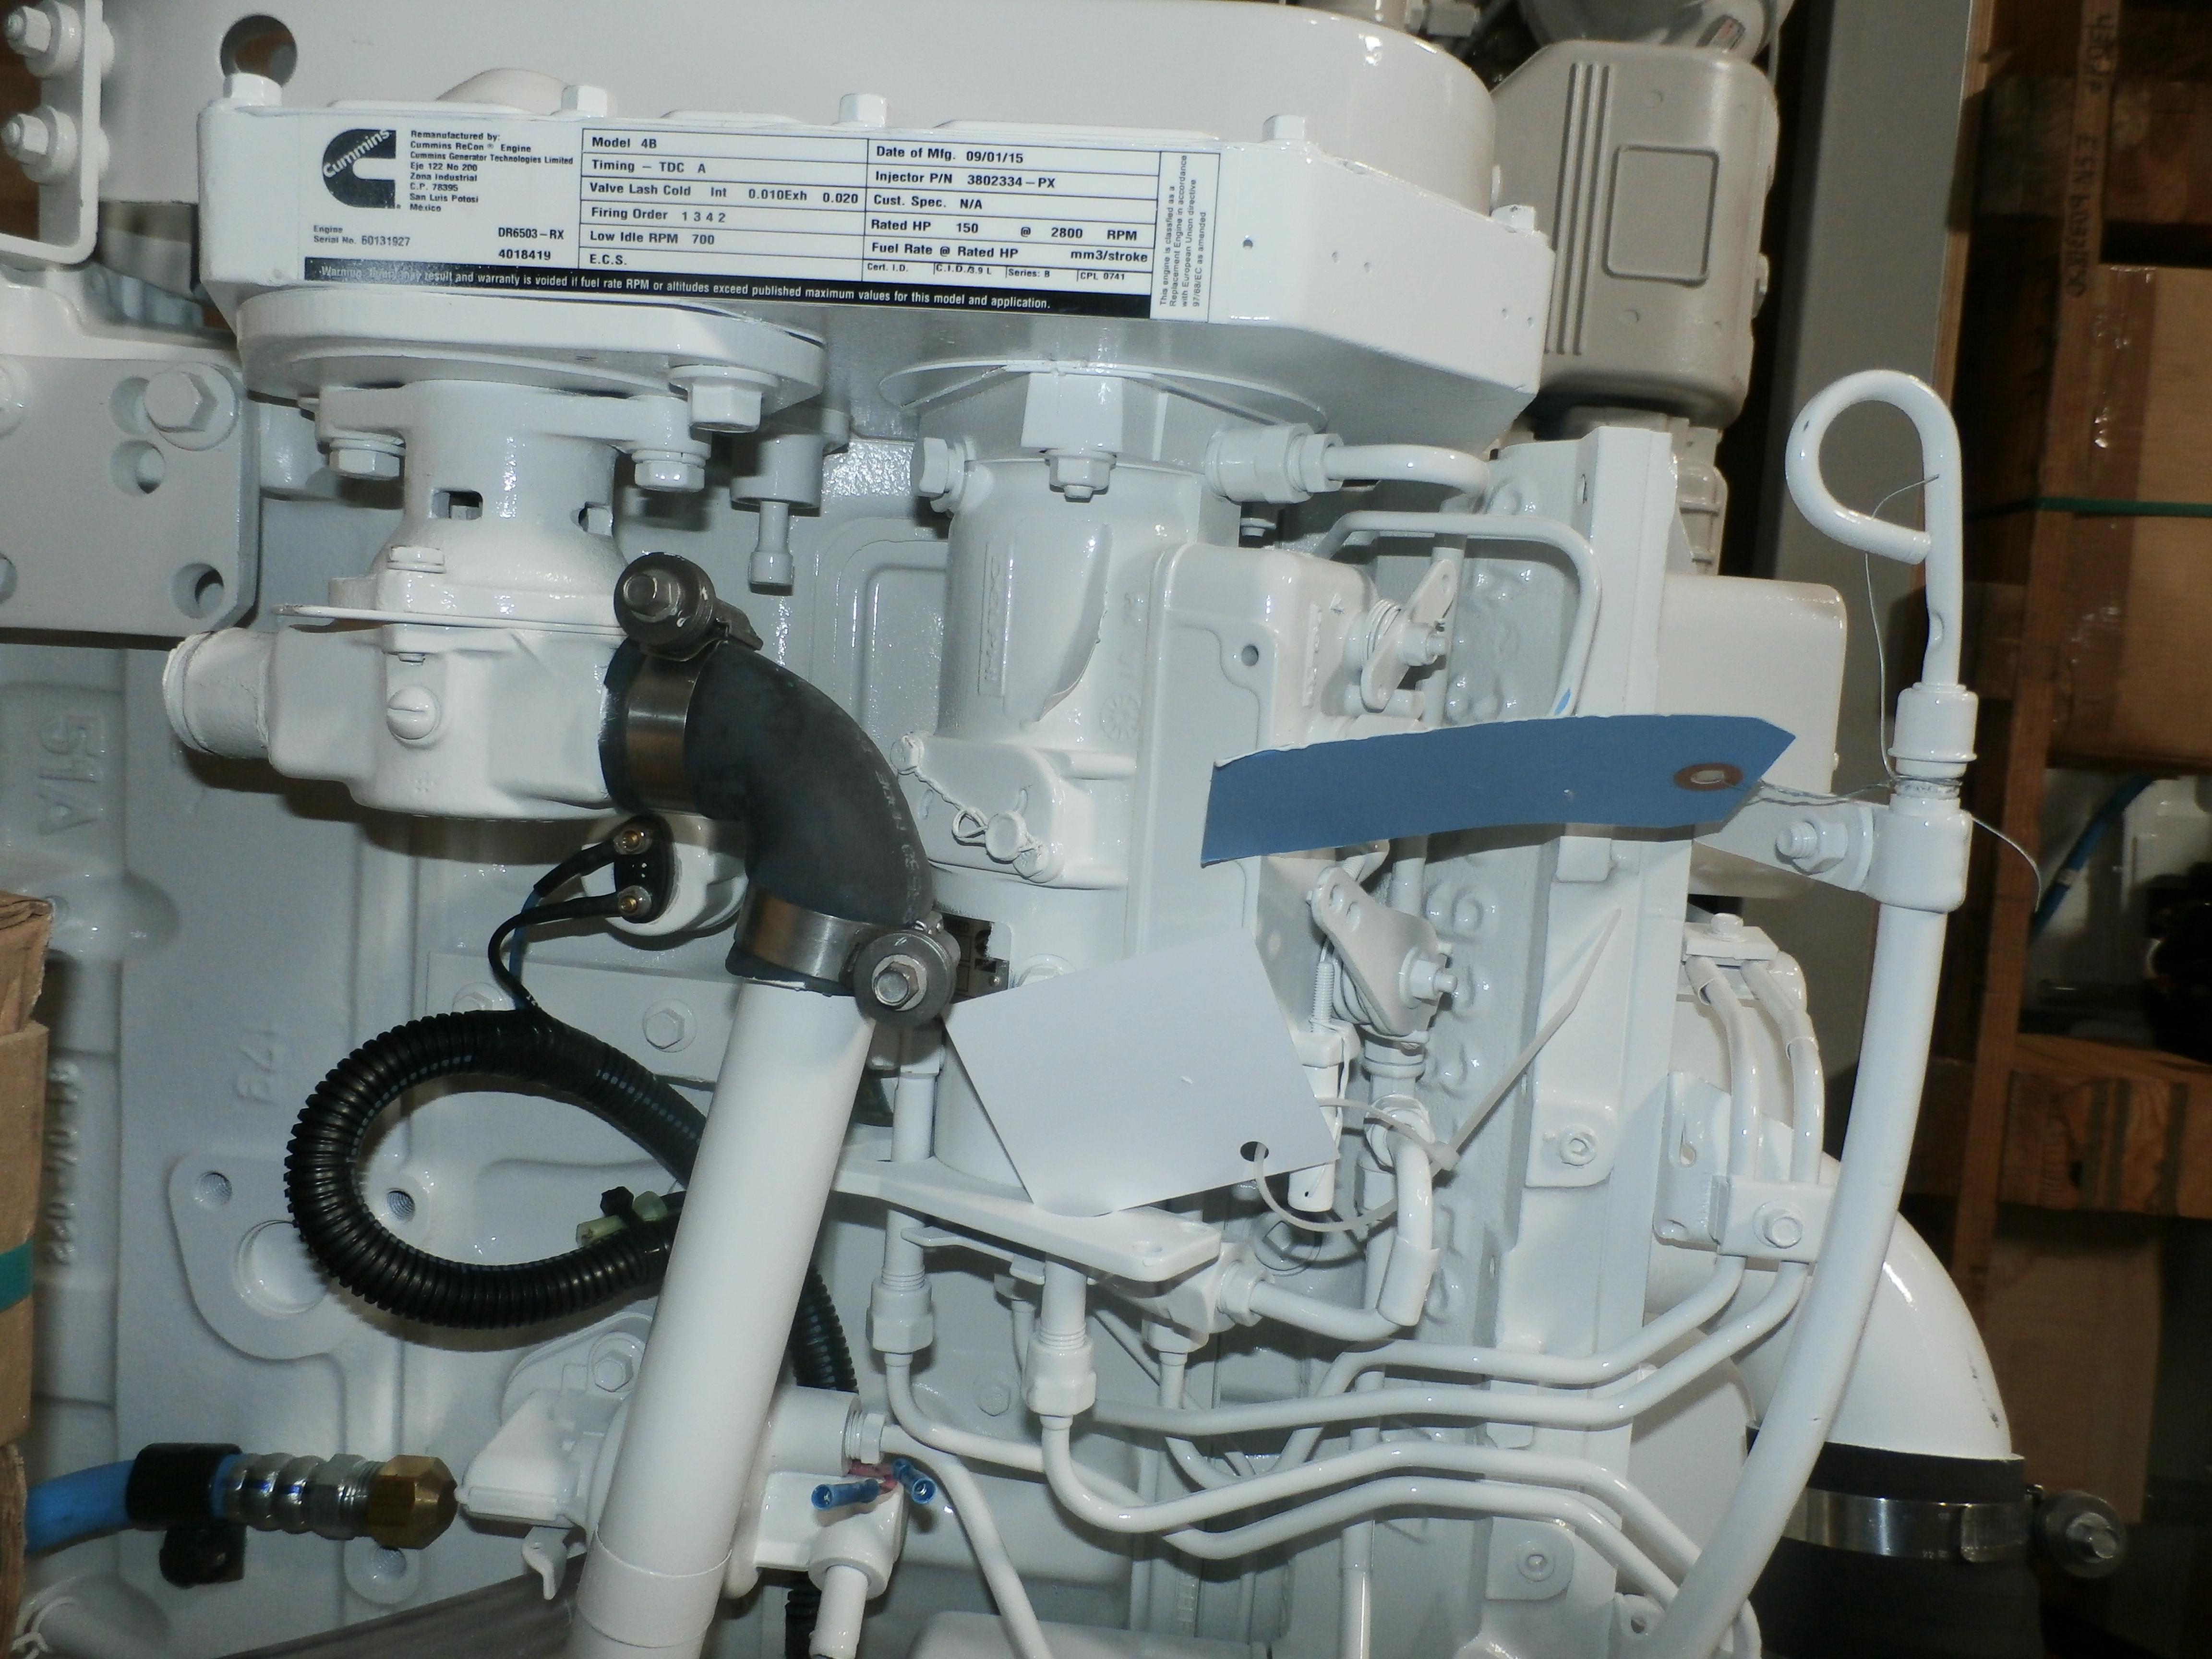 How to Find your Cummins Marine Engine Details - Seaboard Marine